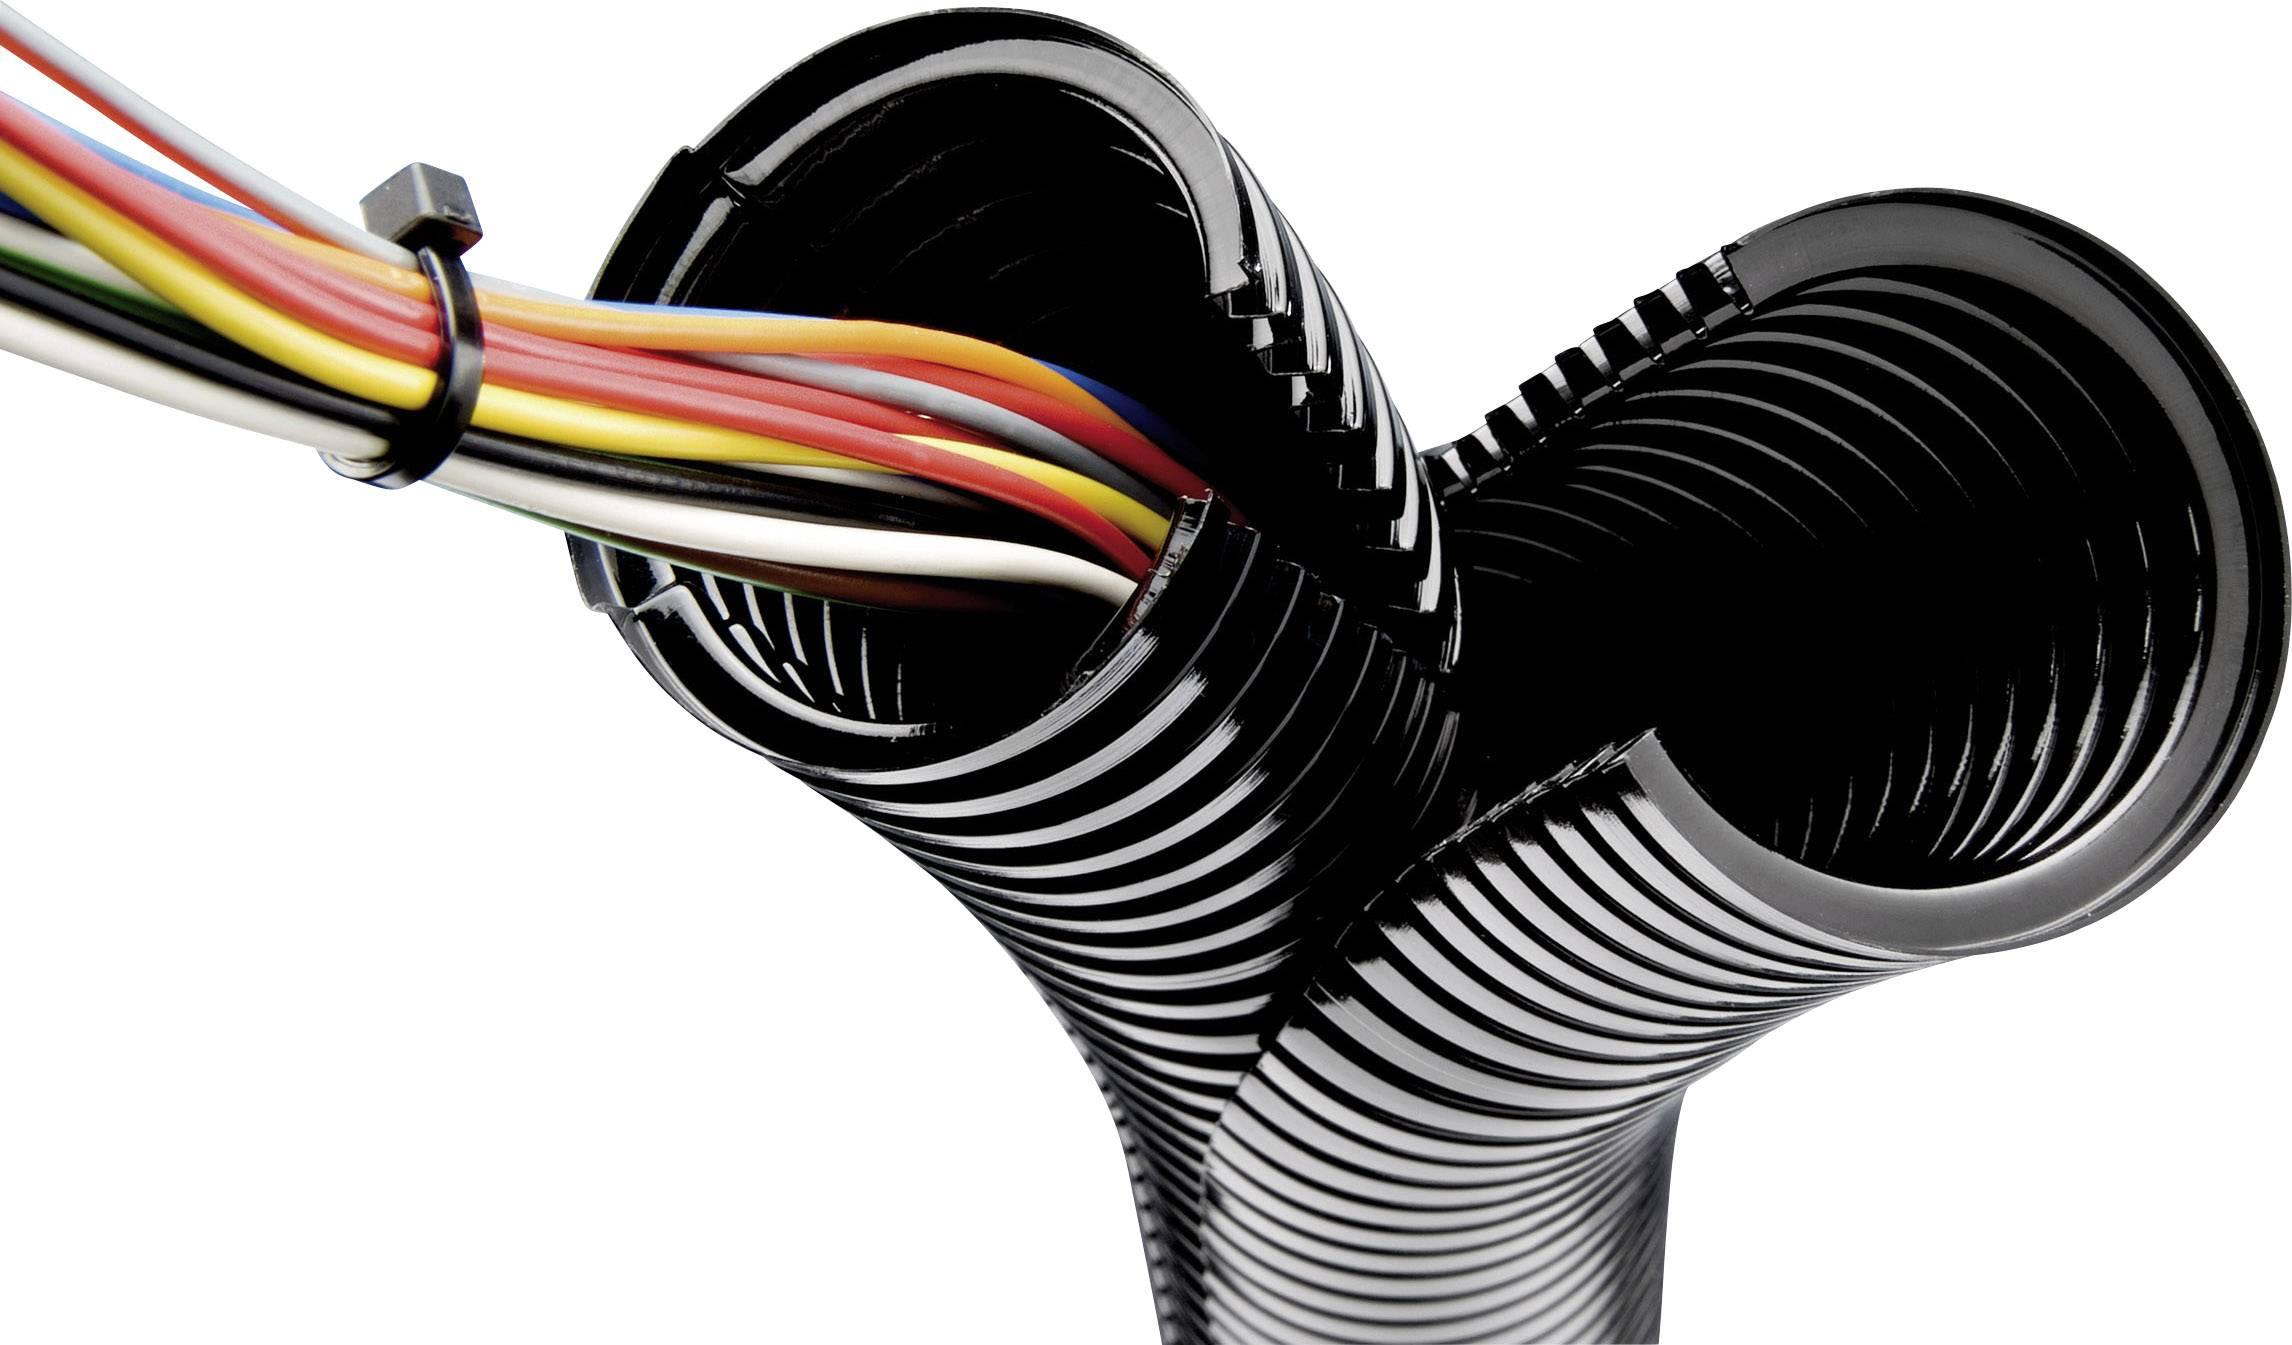 Ochranná hadica na káble LappKabel SILVYN® SPLIT 14 61806630, 12.90 mm, čierna, metrový tovar